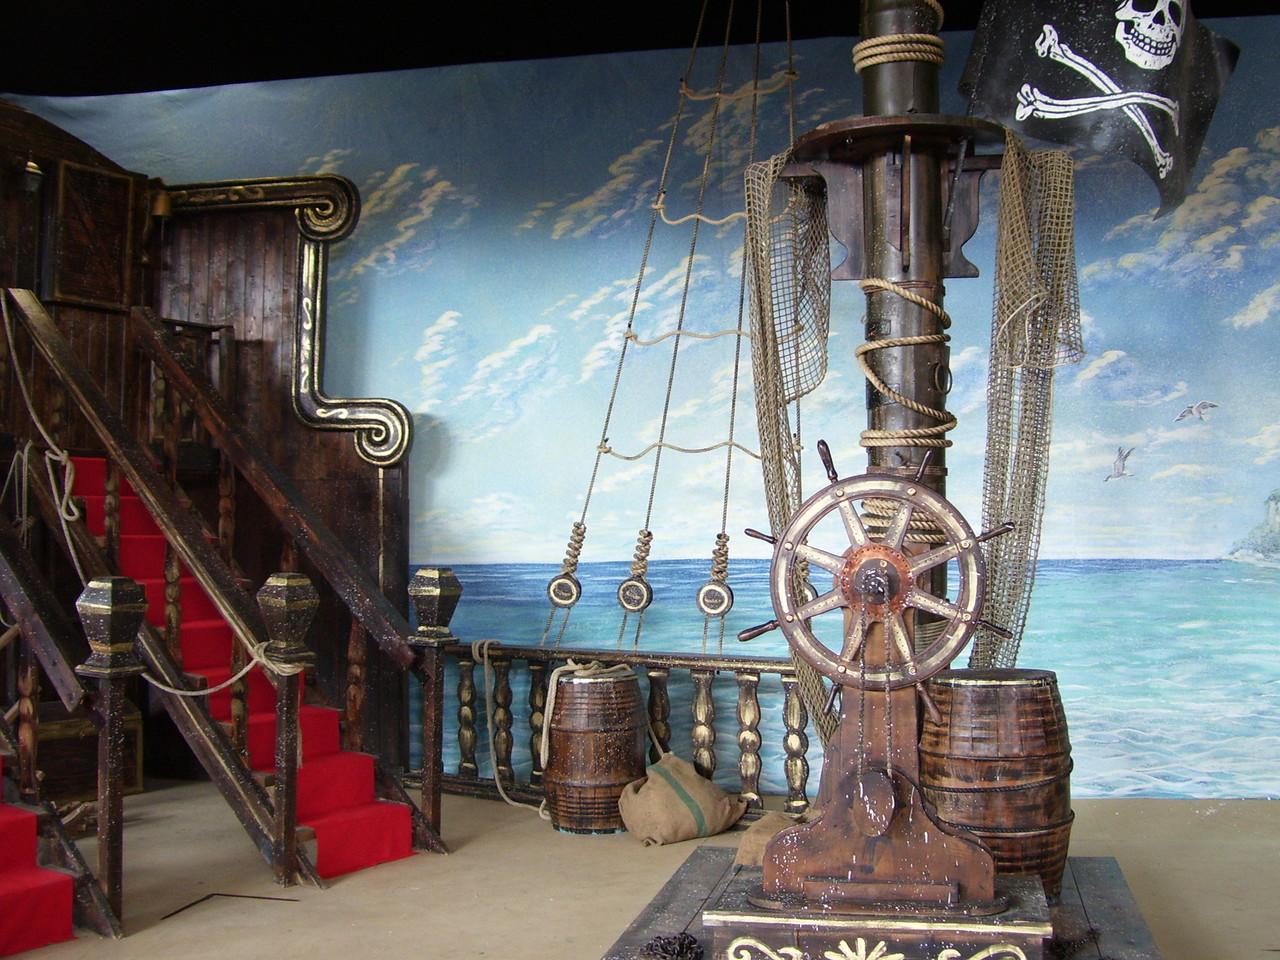 La nave di Capitan Uncino